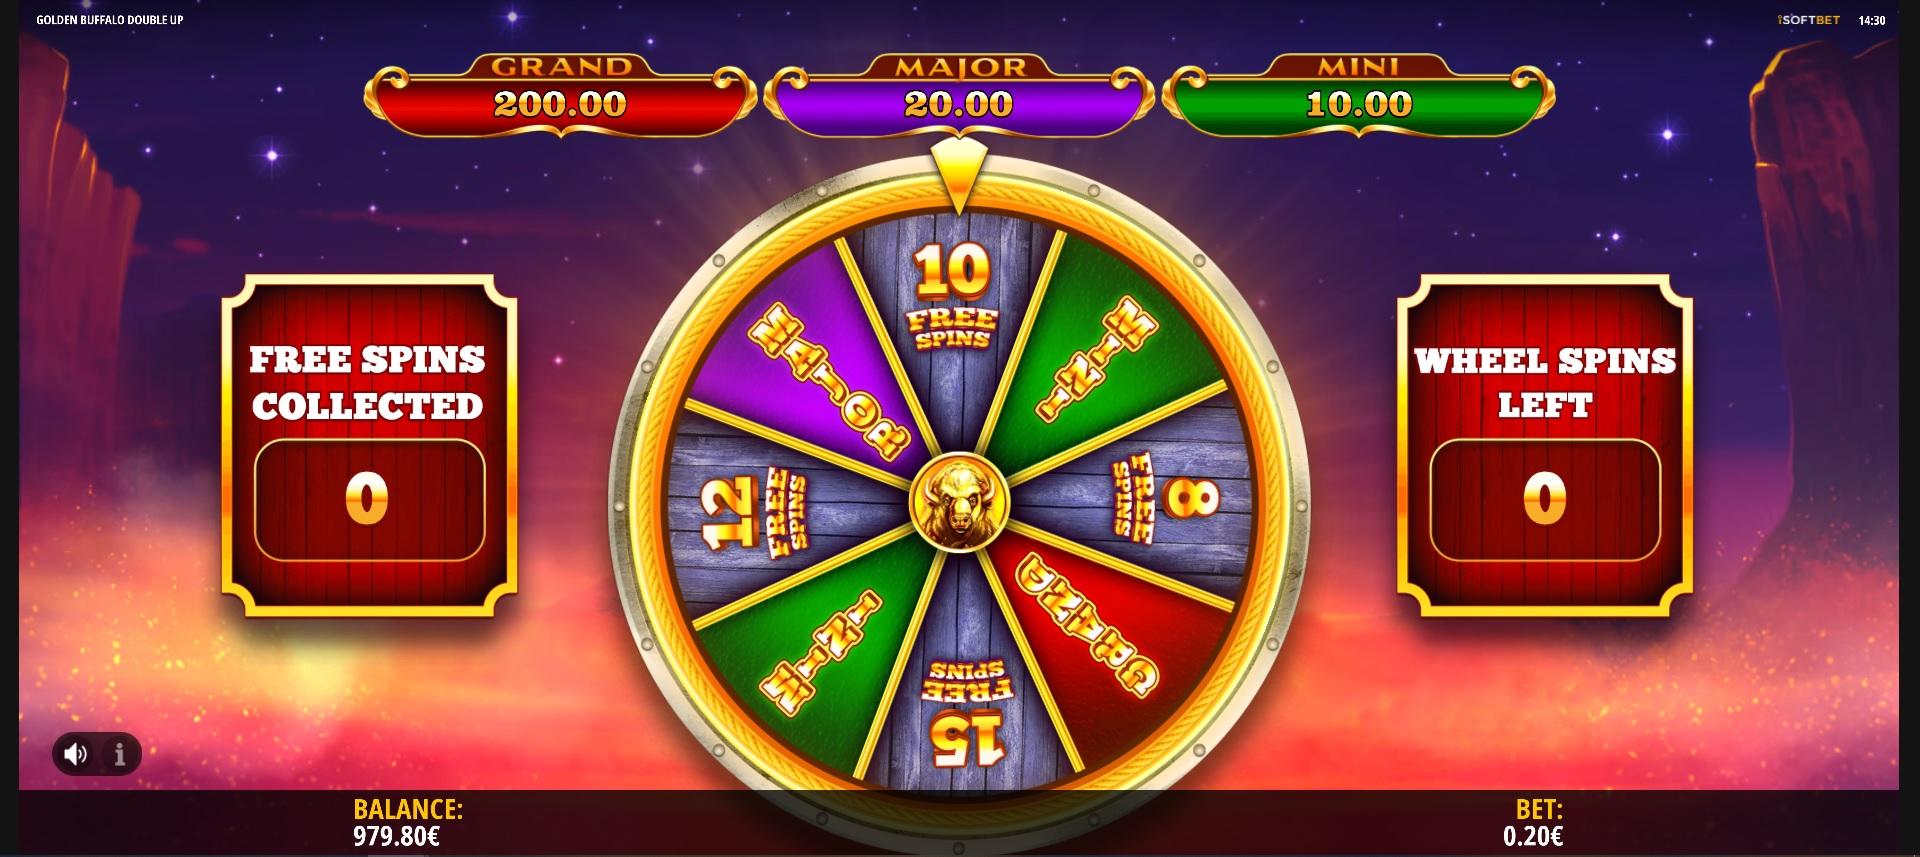 How to win big in Golden Buffalo: Double Up – Bonus Wheel